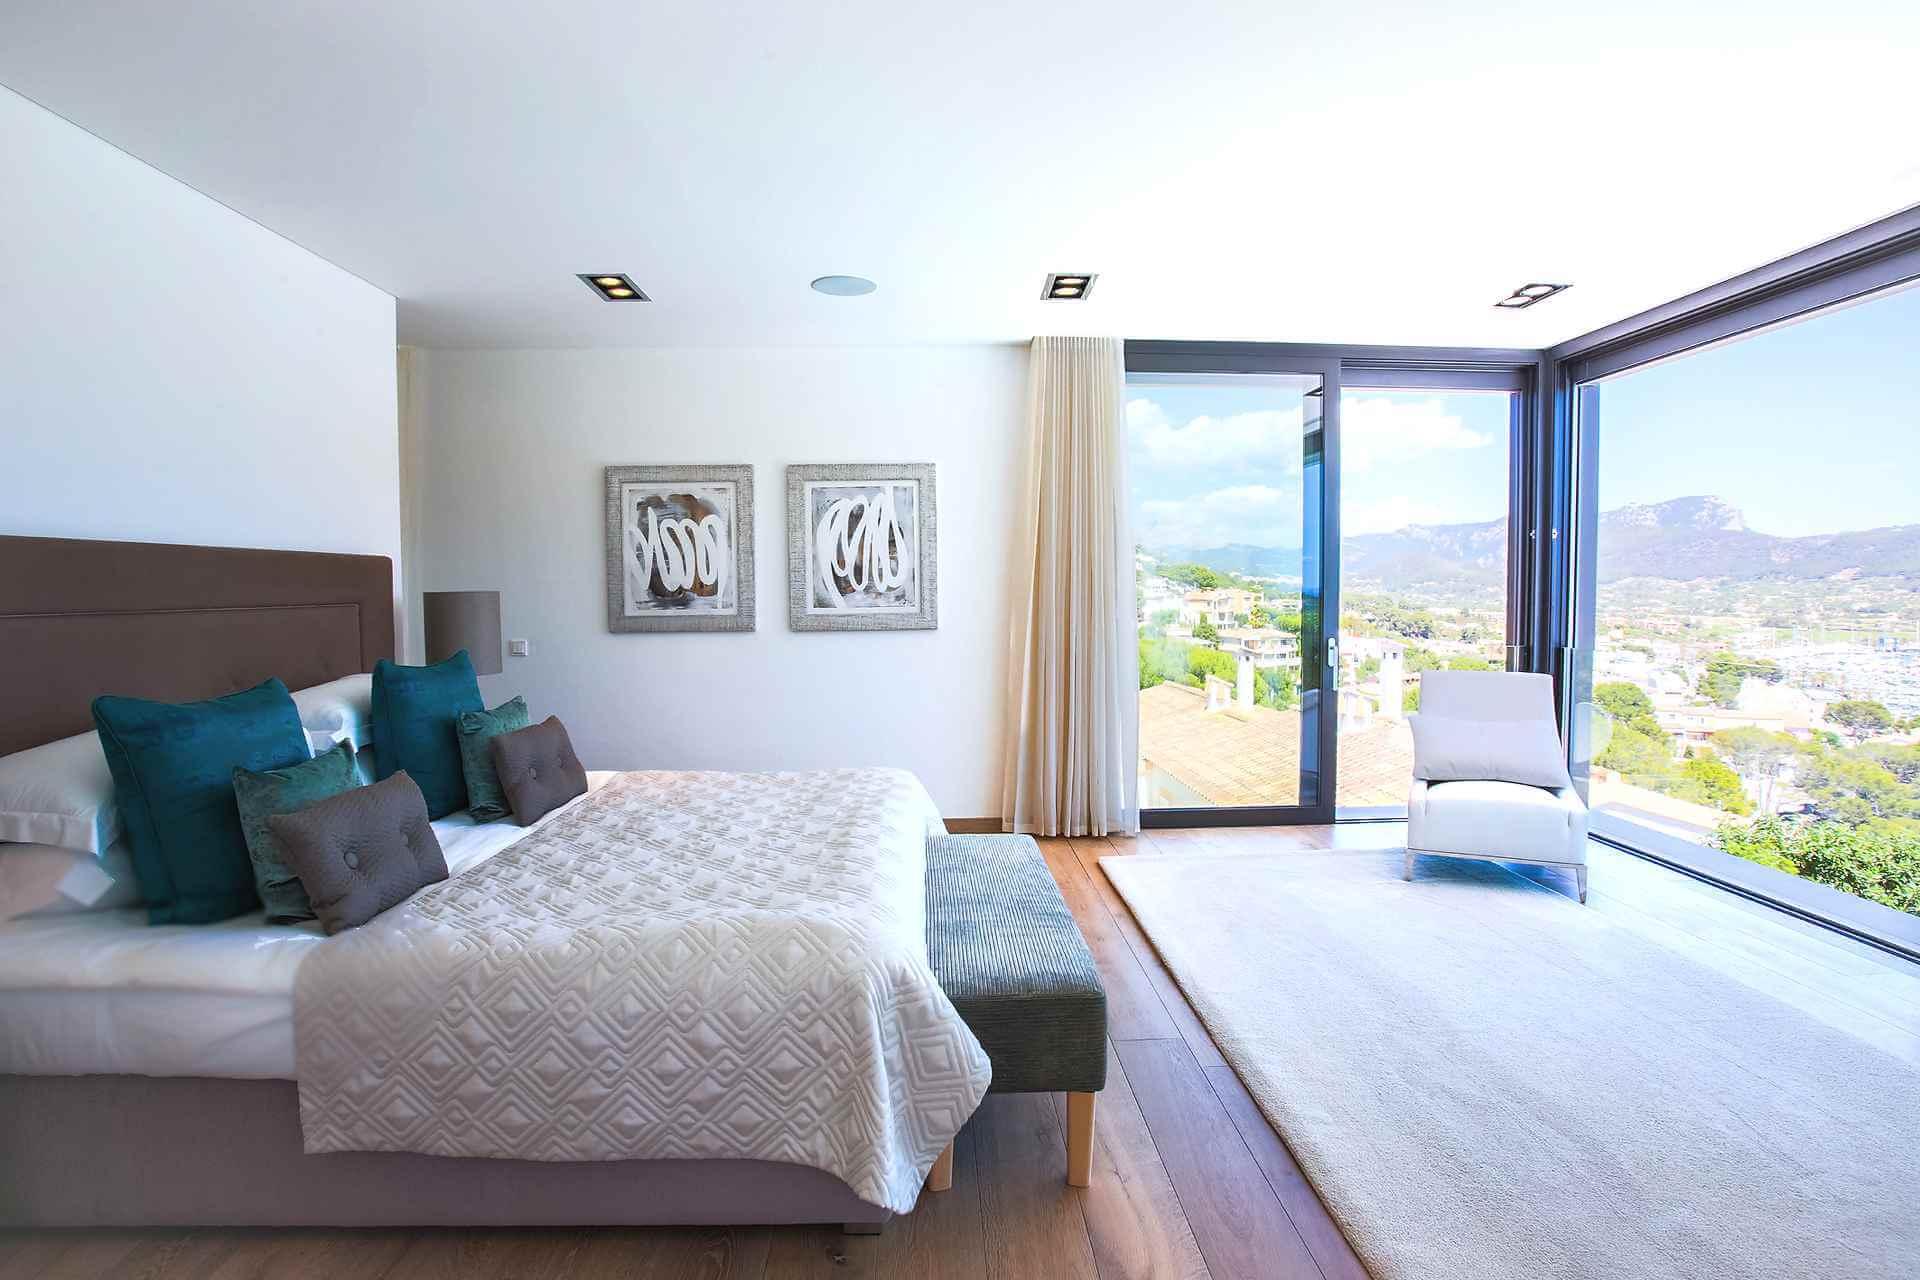 01-353 Villa with indoor pool Mallorca Southwest Bild 18